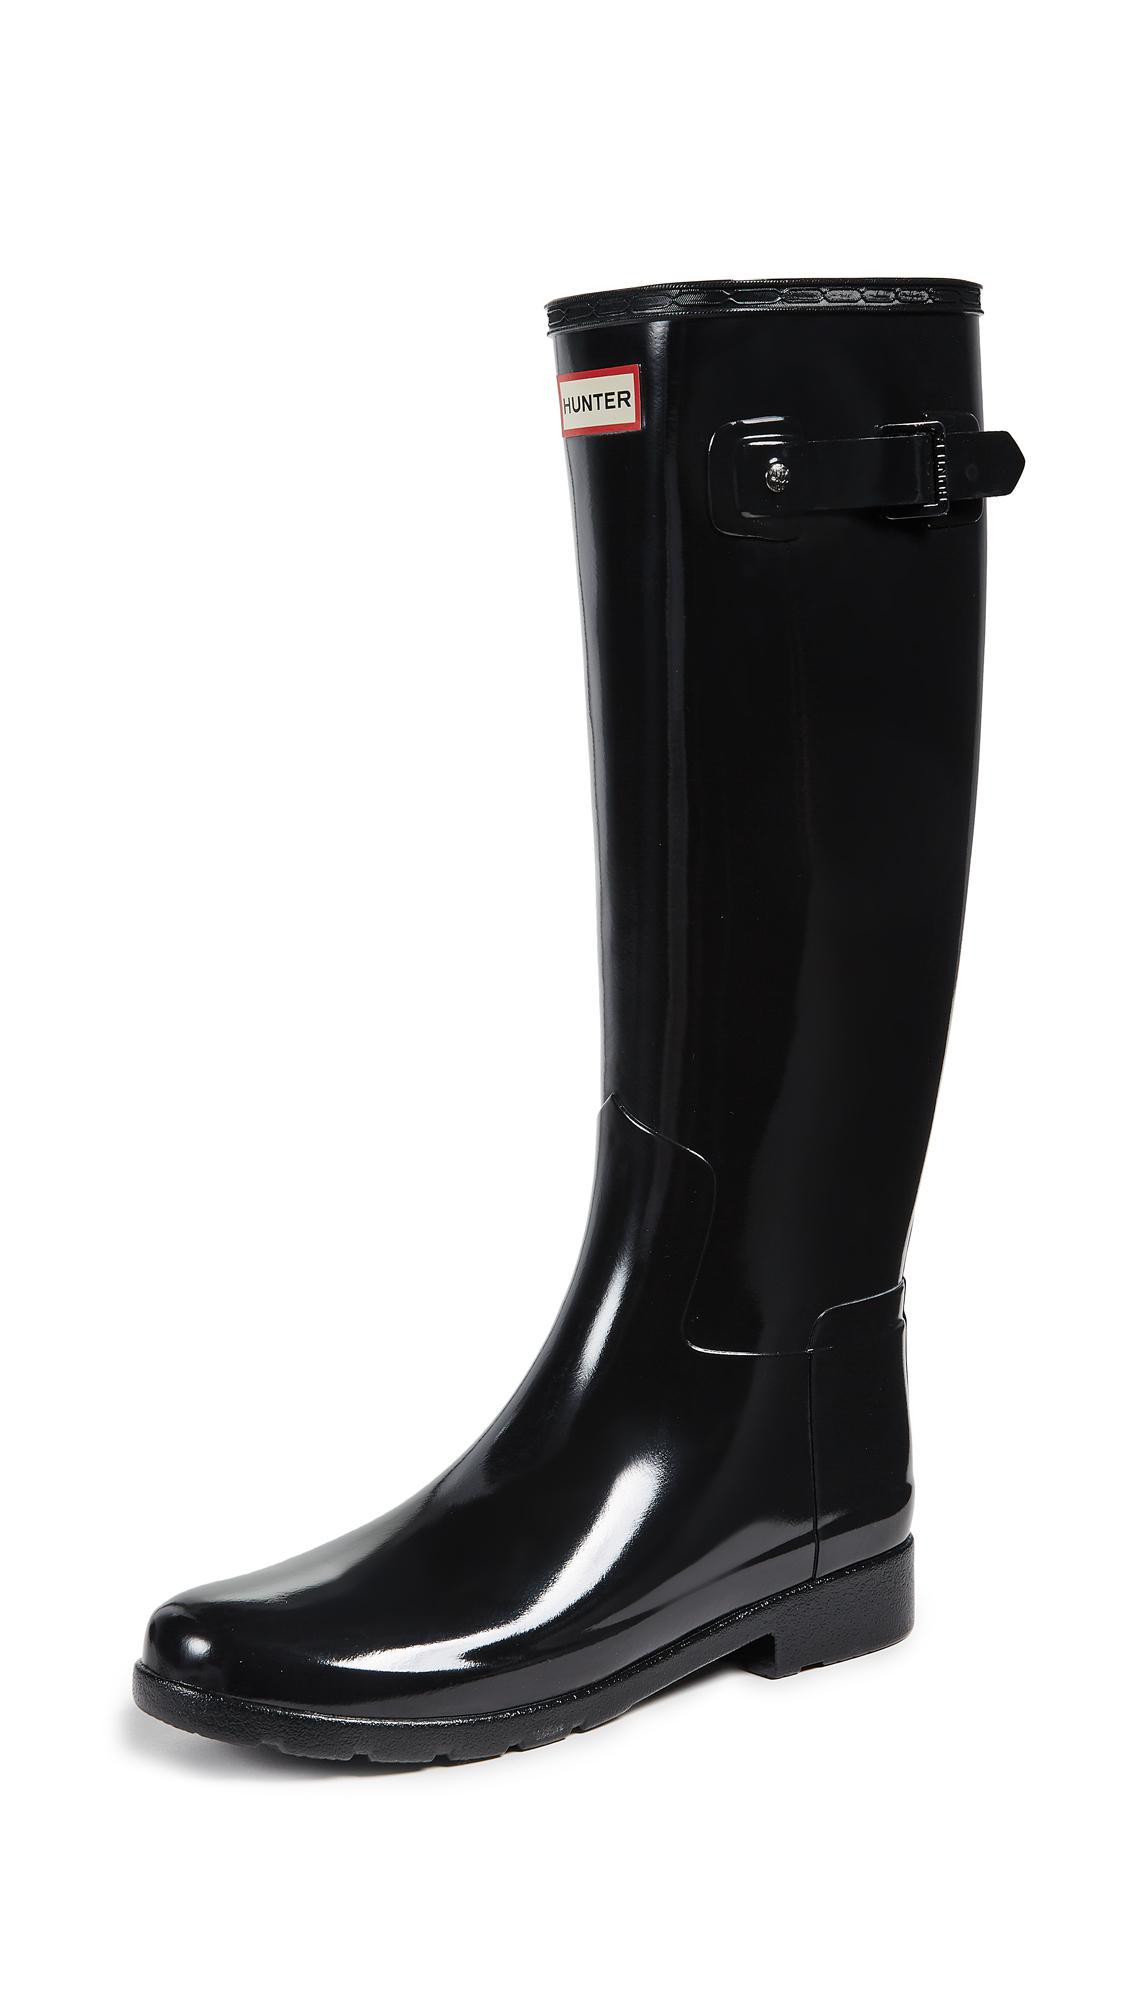 Hunter Boots Original Refined Gloss Boots - Black